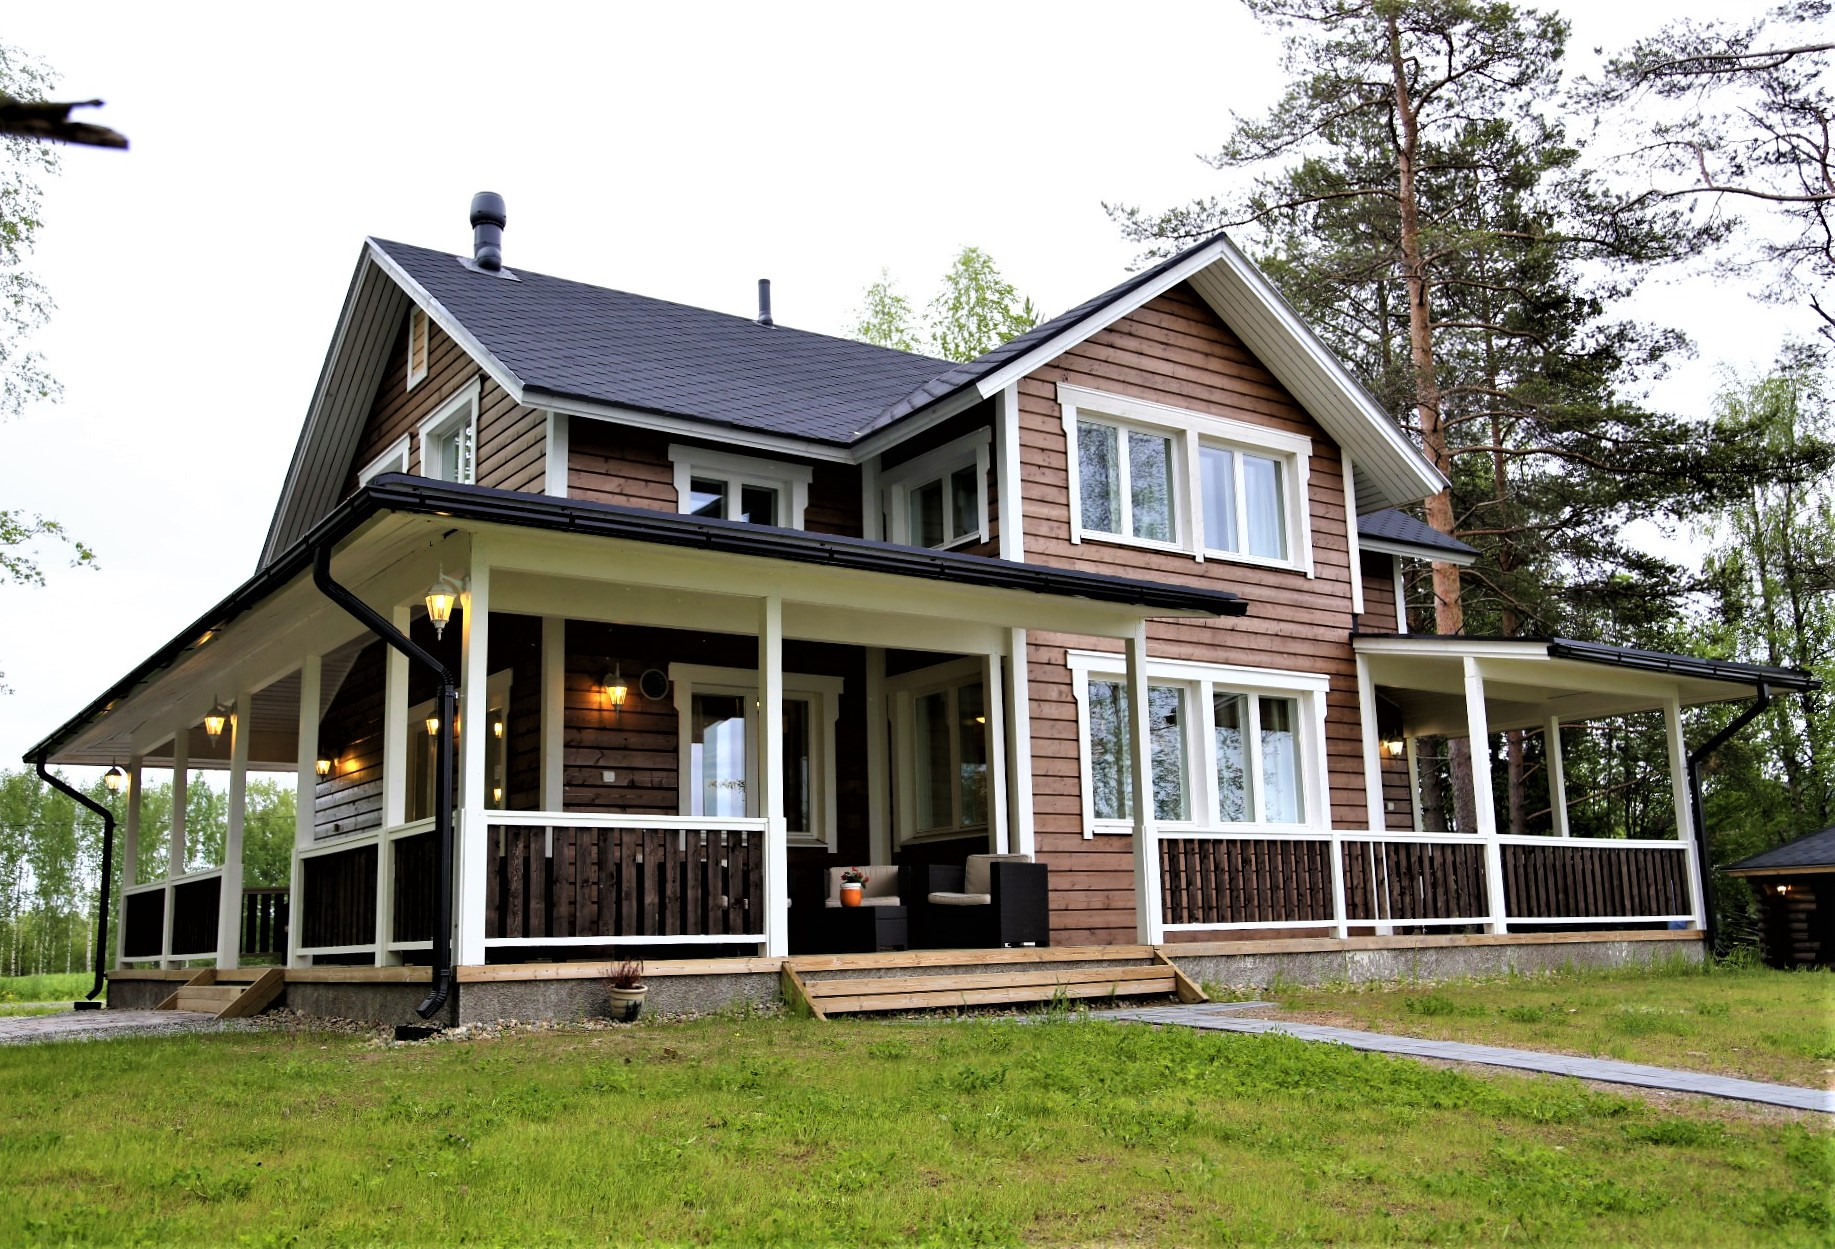 Haapaniemi Cottages